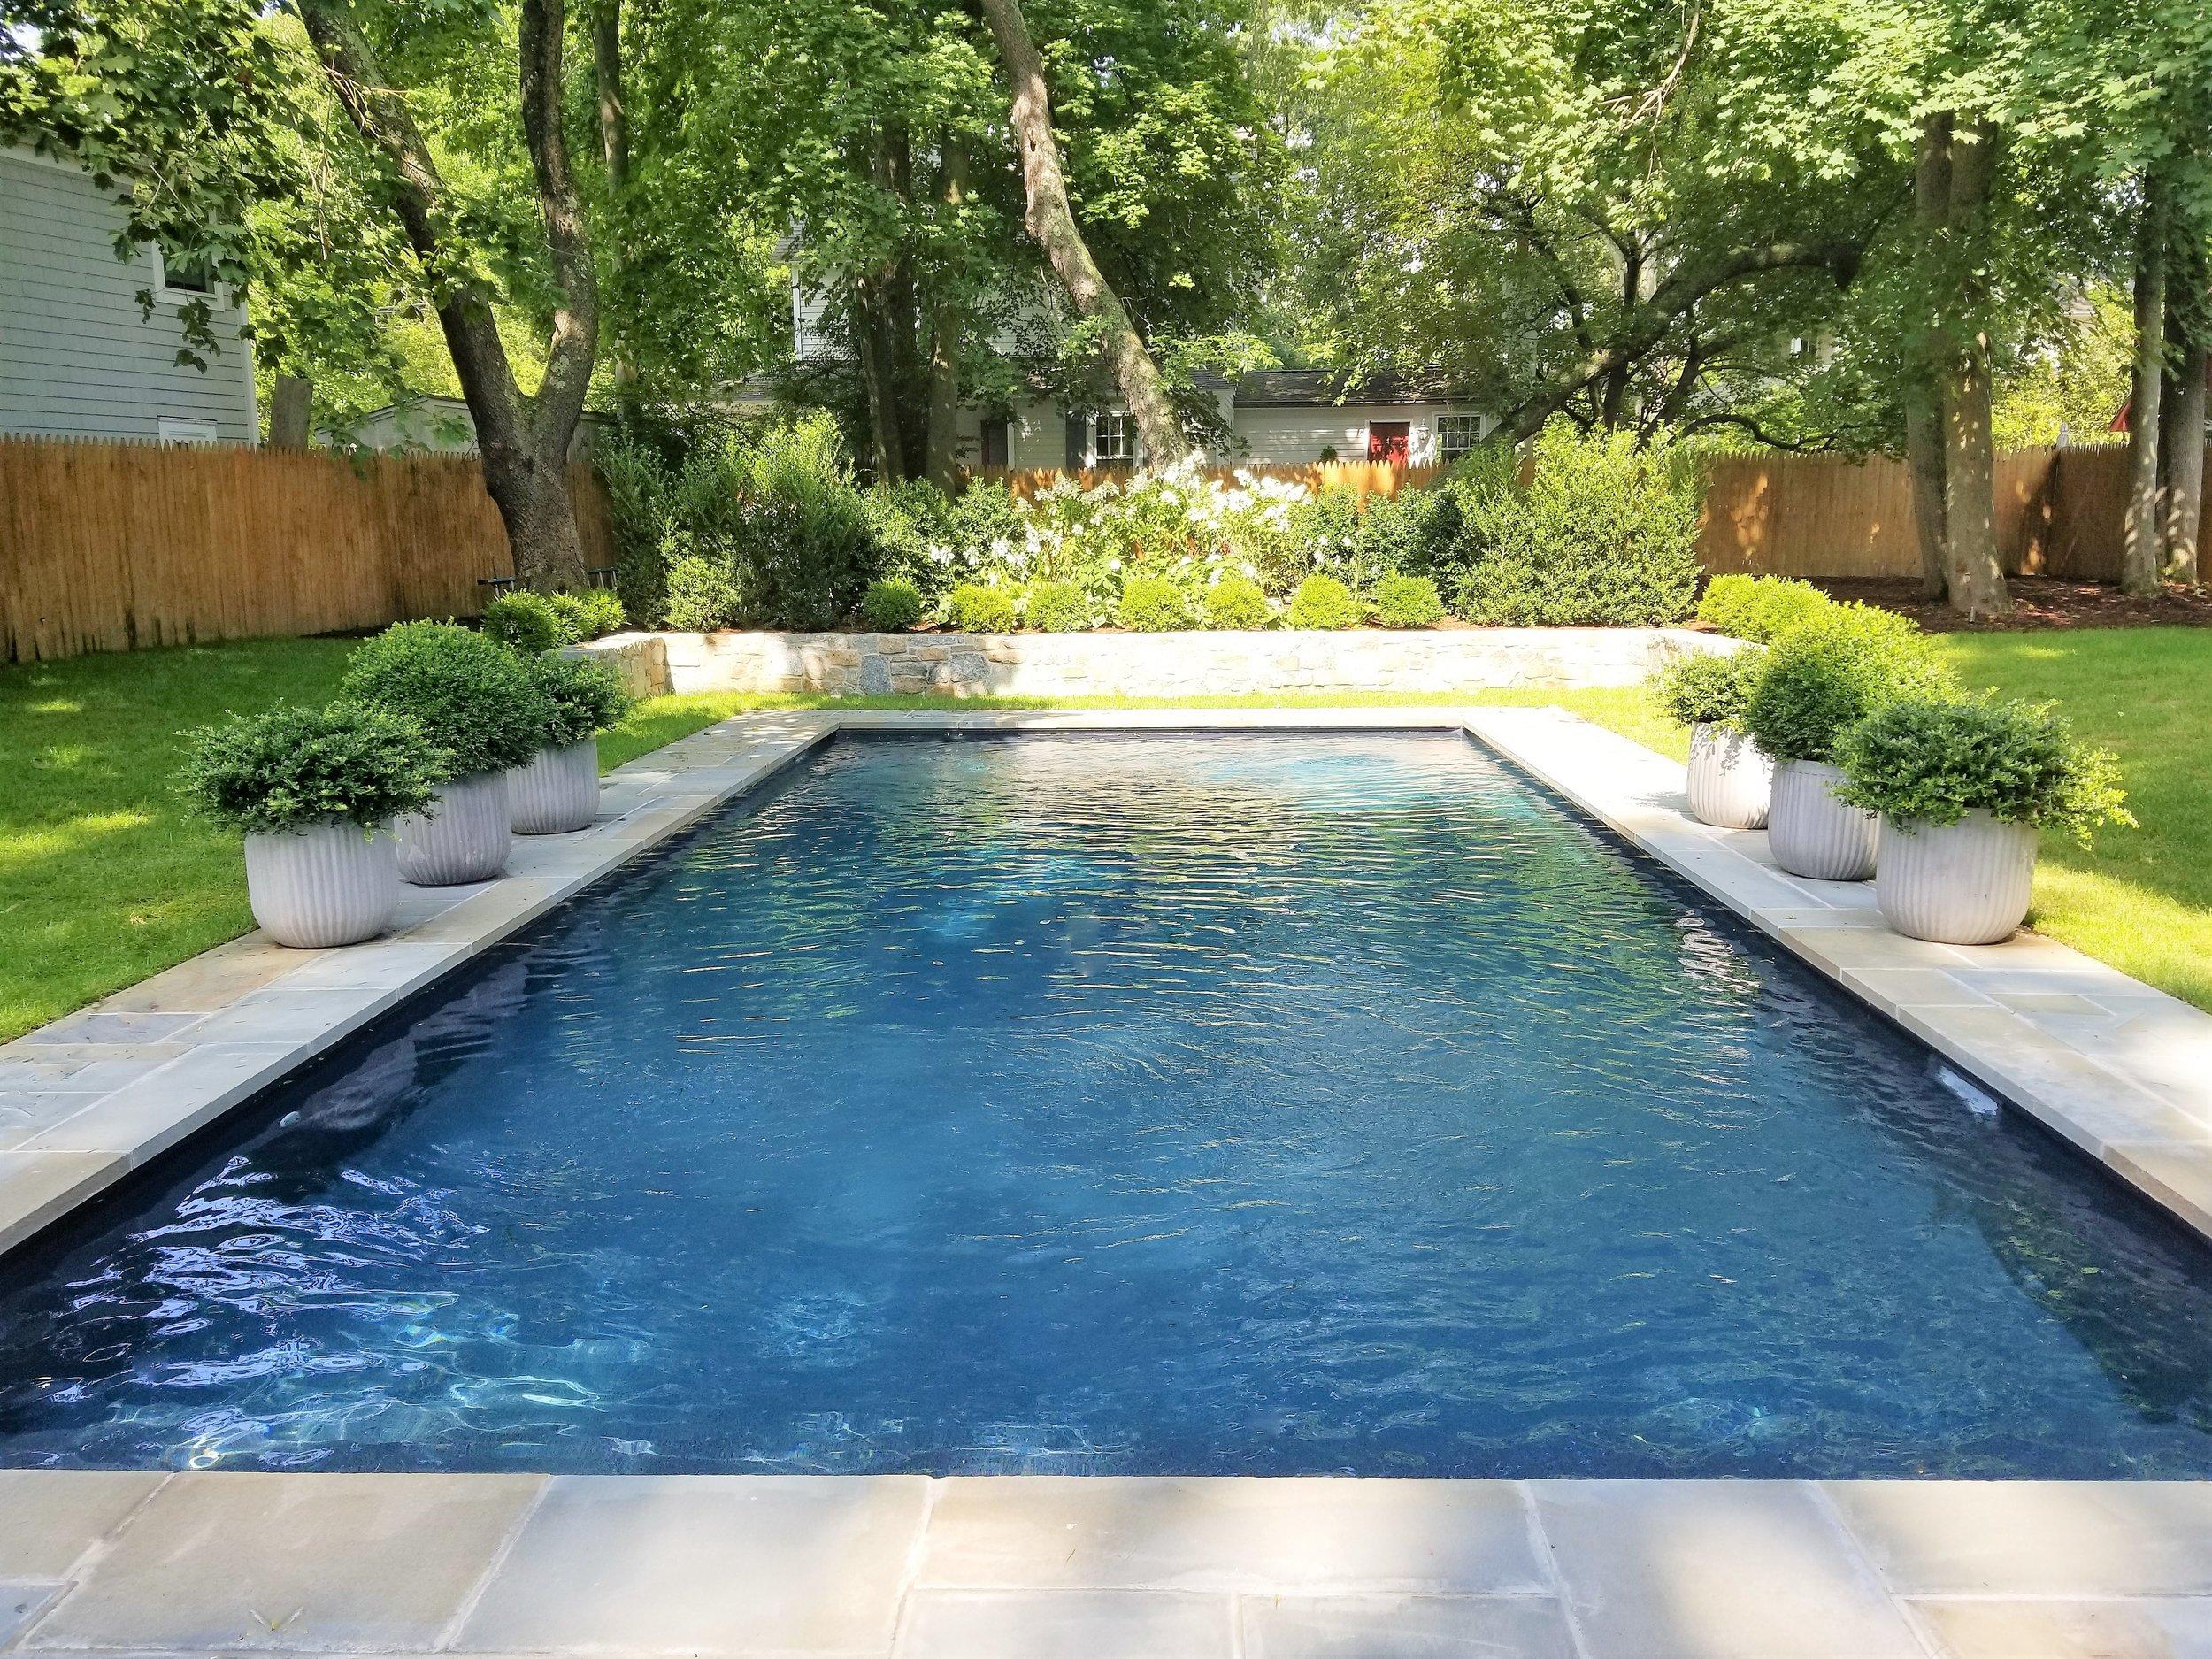 Rowayton vinyl pool retreat. Classic English garden style.